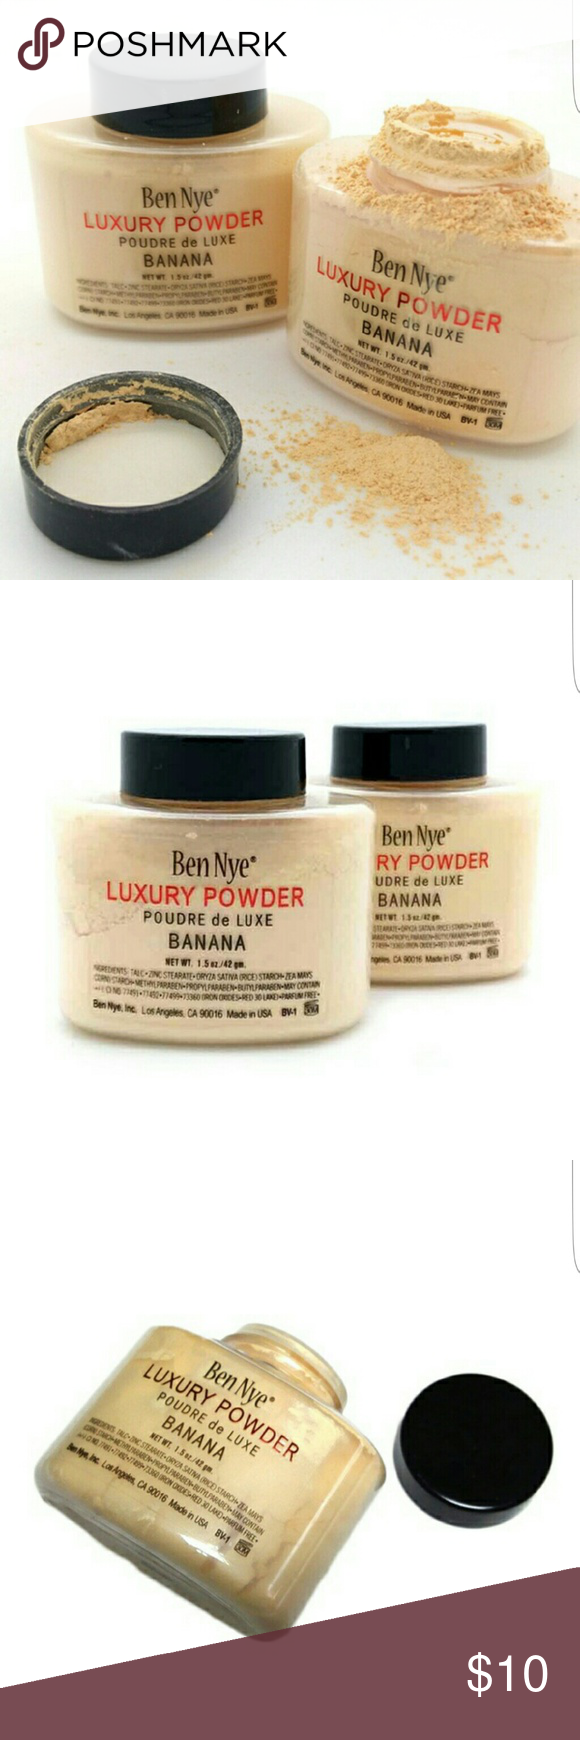 Ben Nye Banana Powder Banana powder, Ben nye, Ben nye makeup